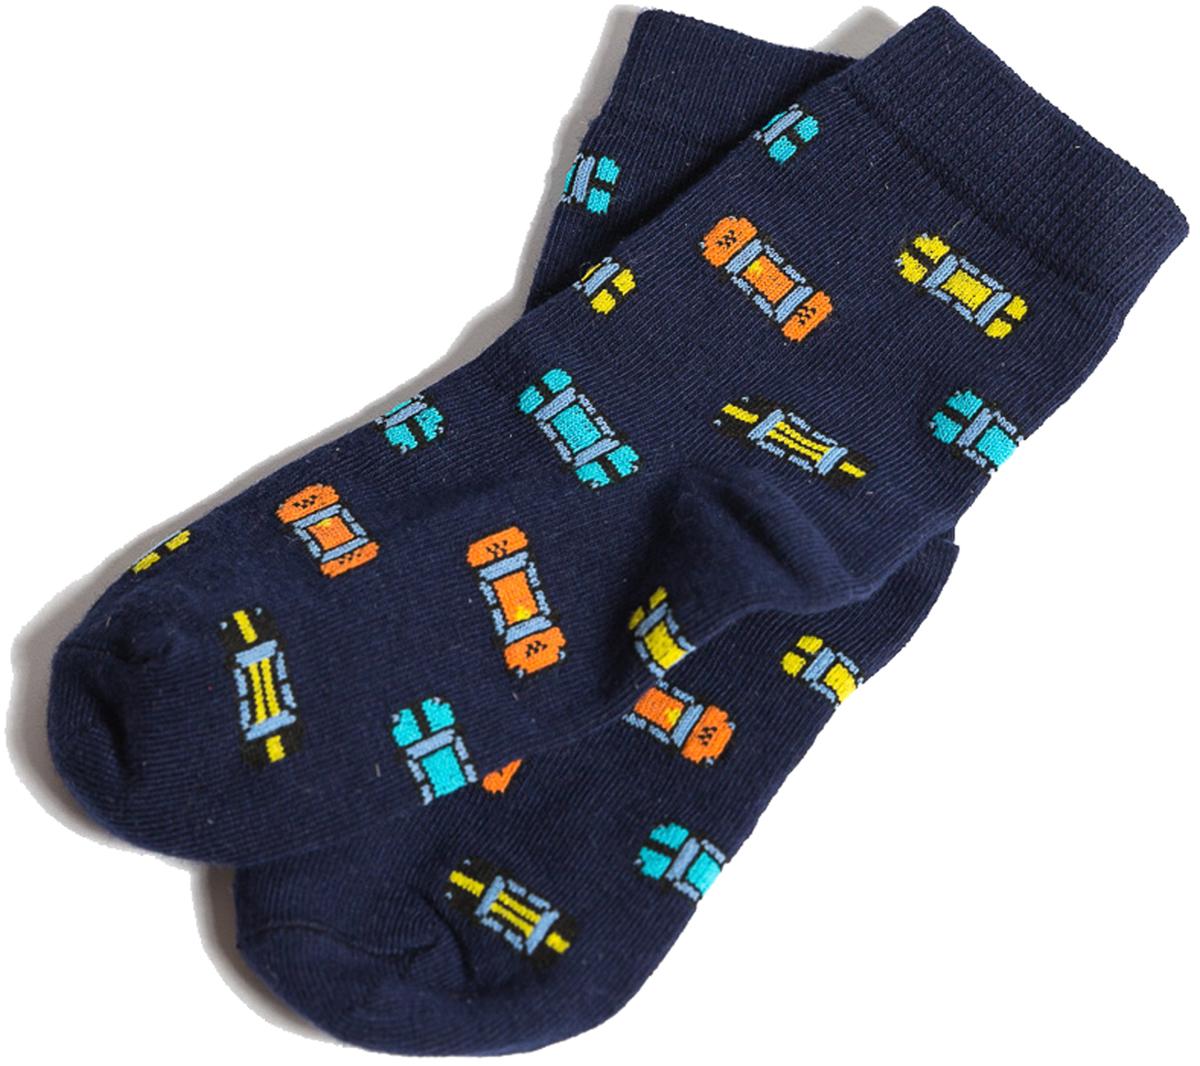 Носки детские Mark Formelle, цвет: темно-синий. 400K-534_B3-8400K. Размер 25/27